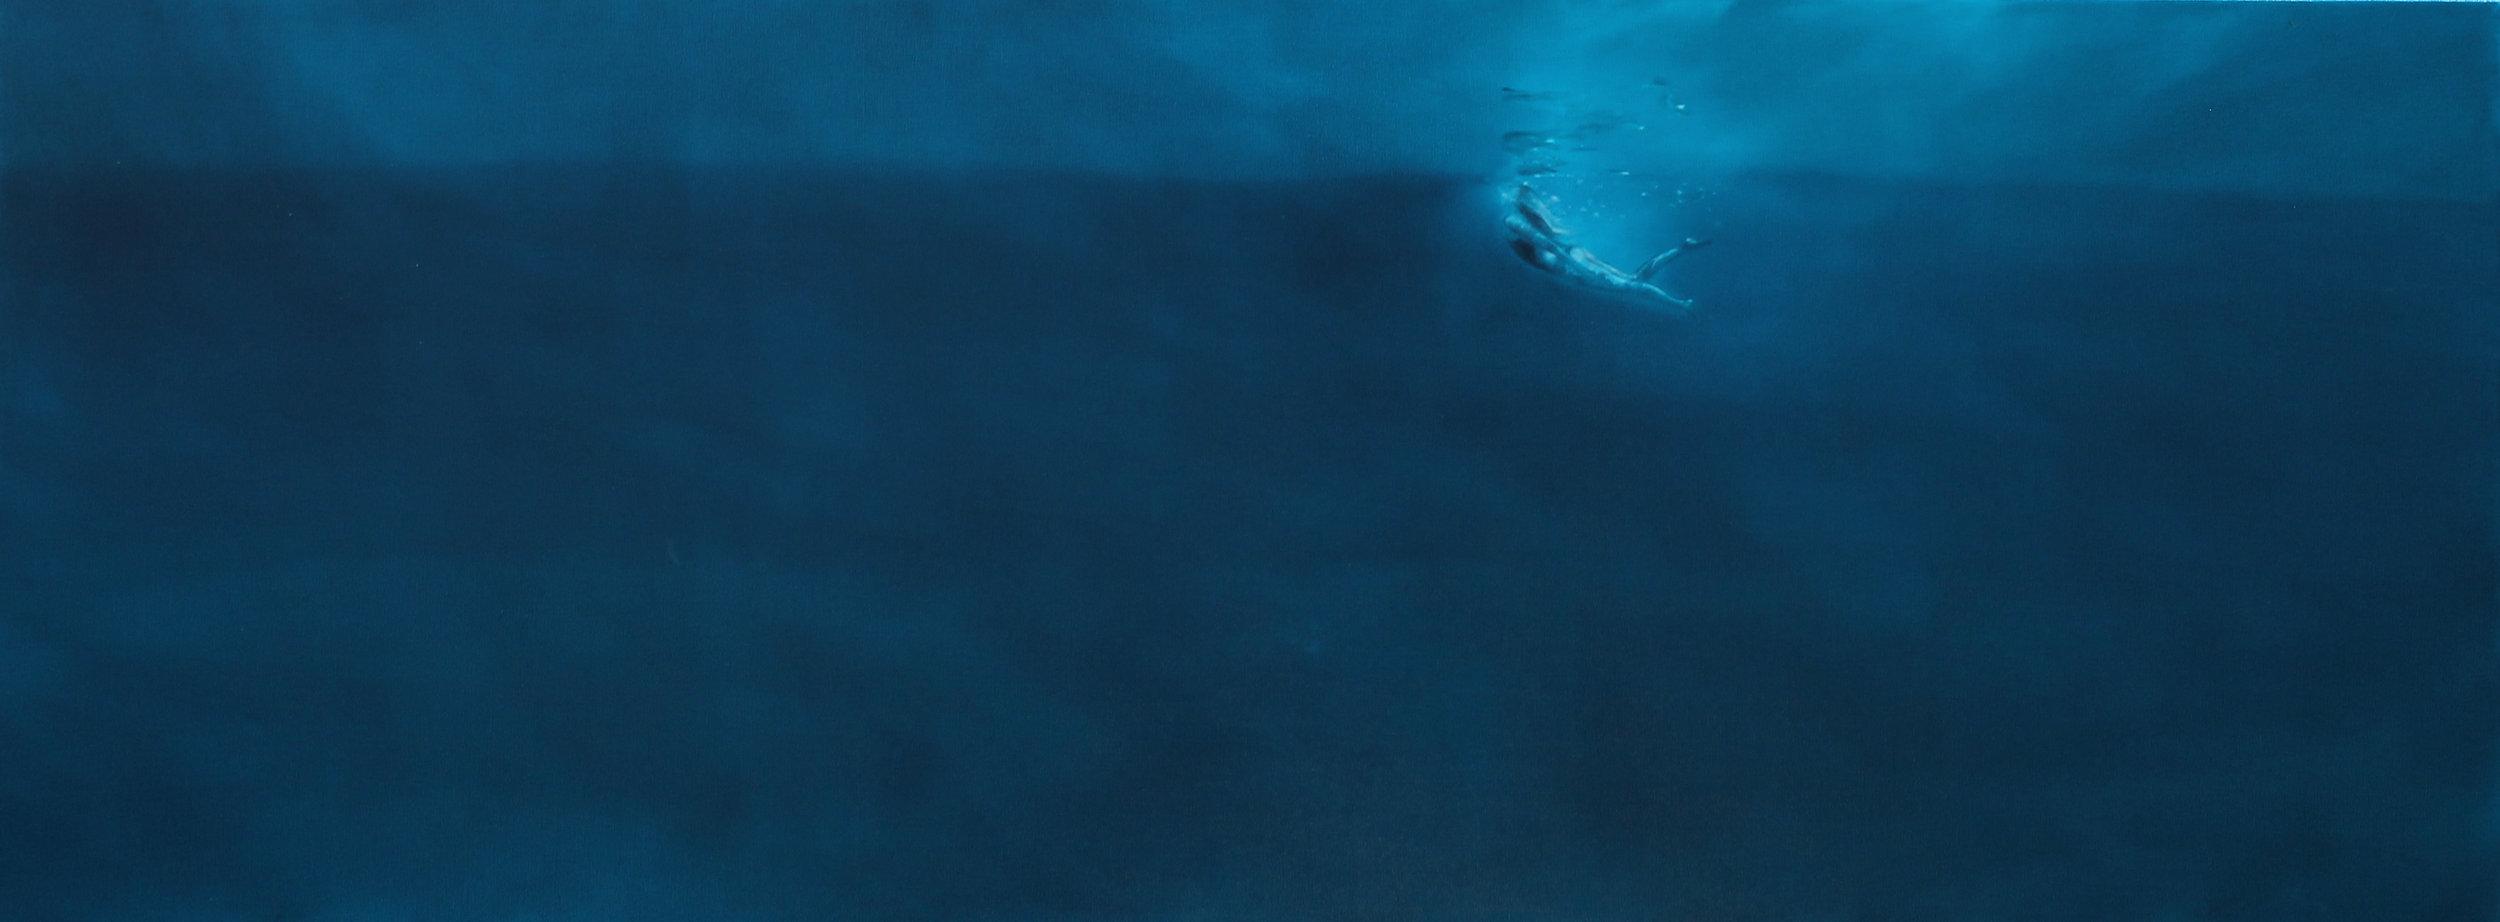 OCEANO 2 BAJA 2017.jpg